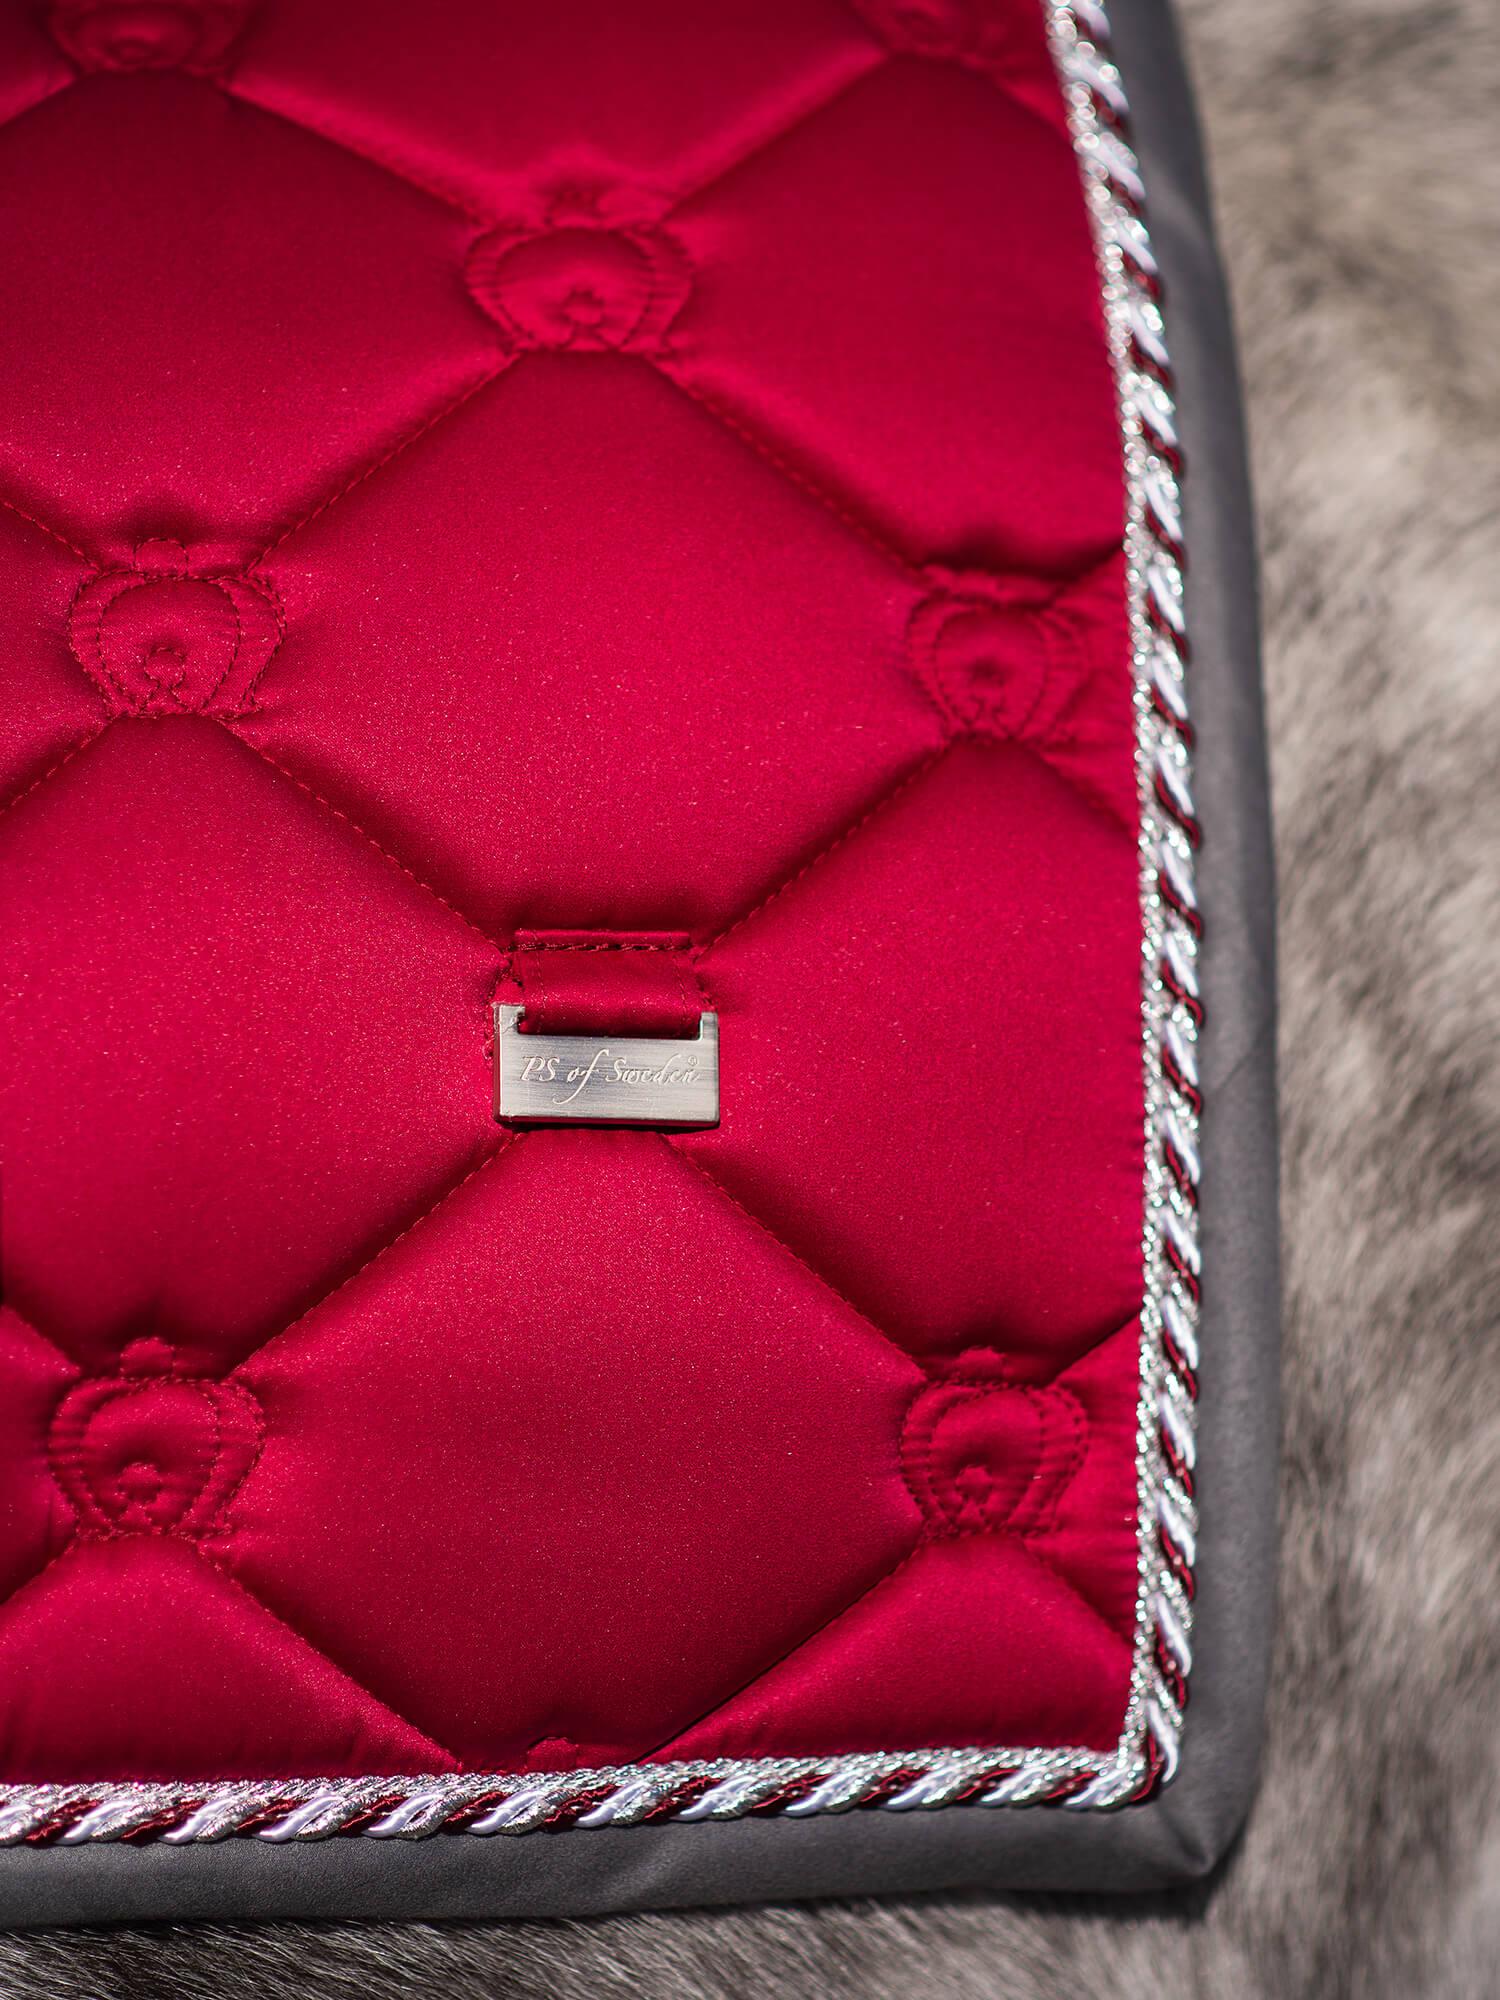 Crimson Red Saddle Pad